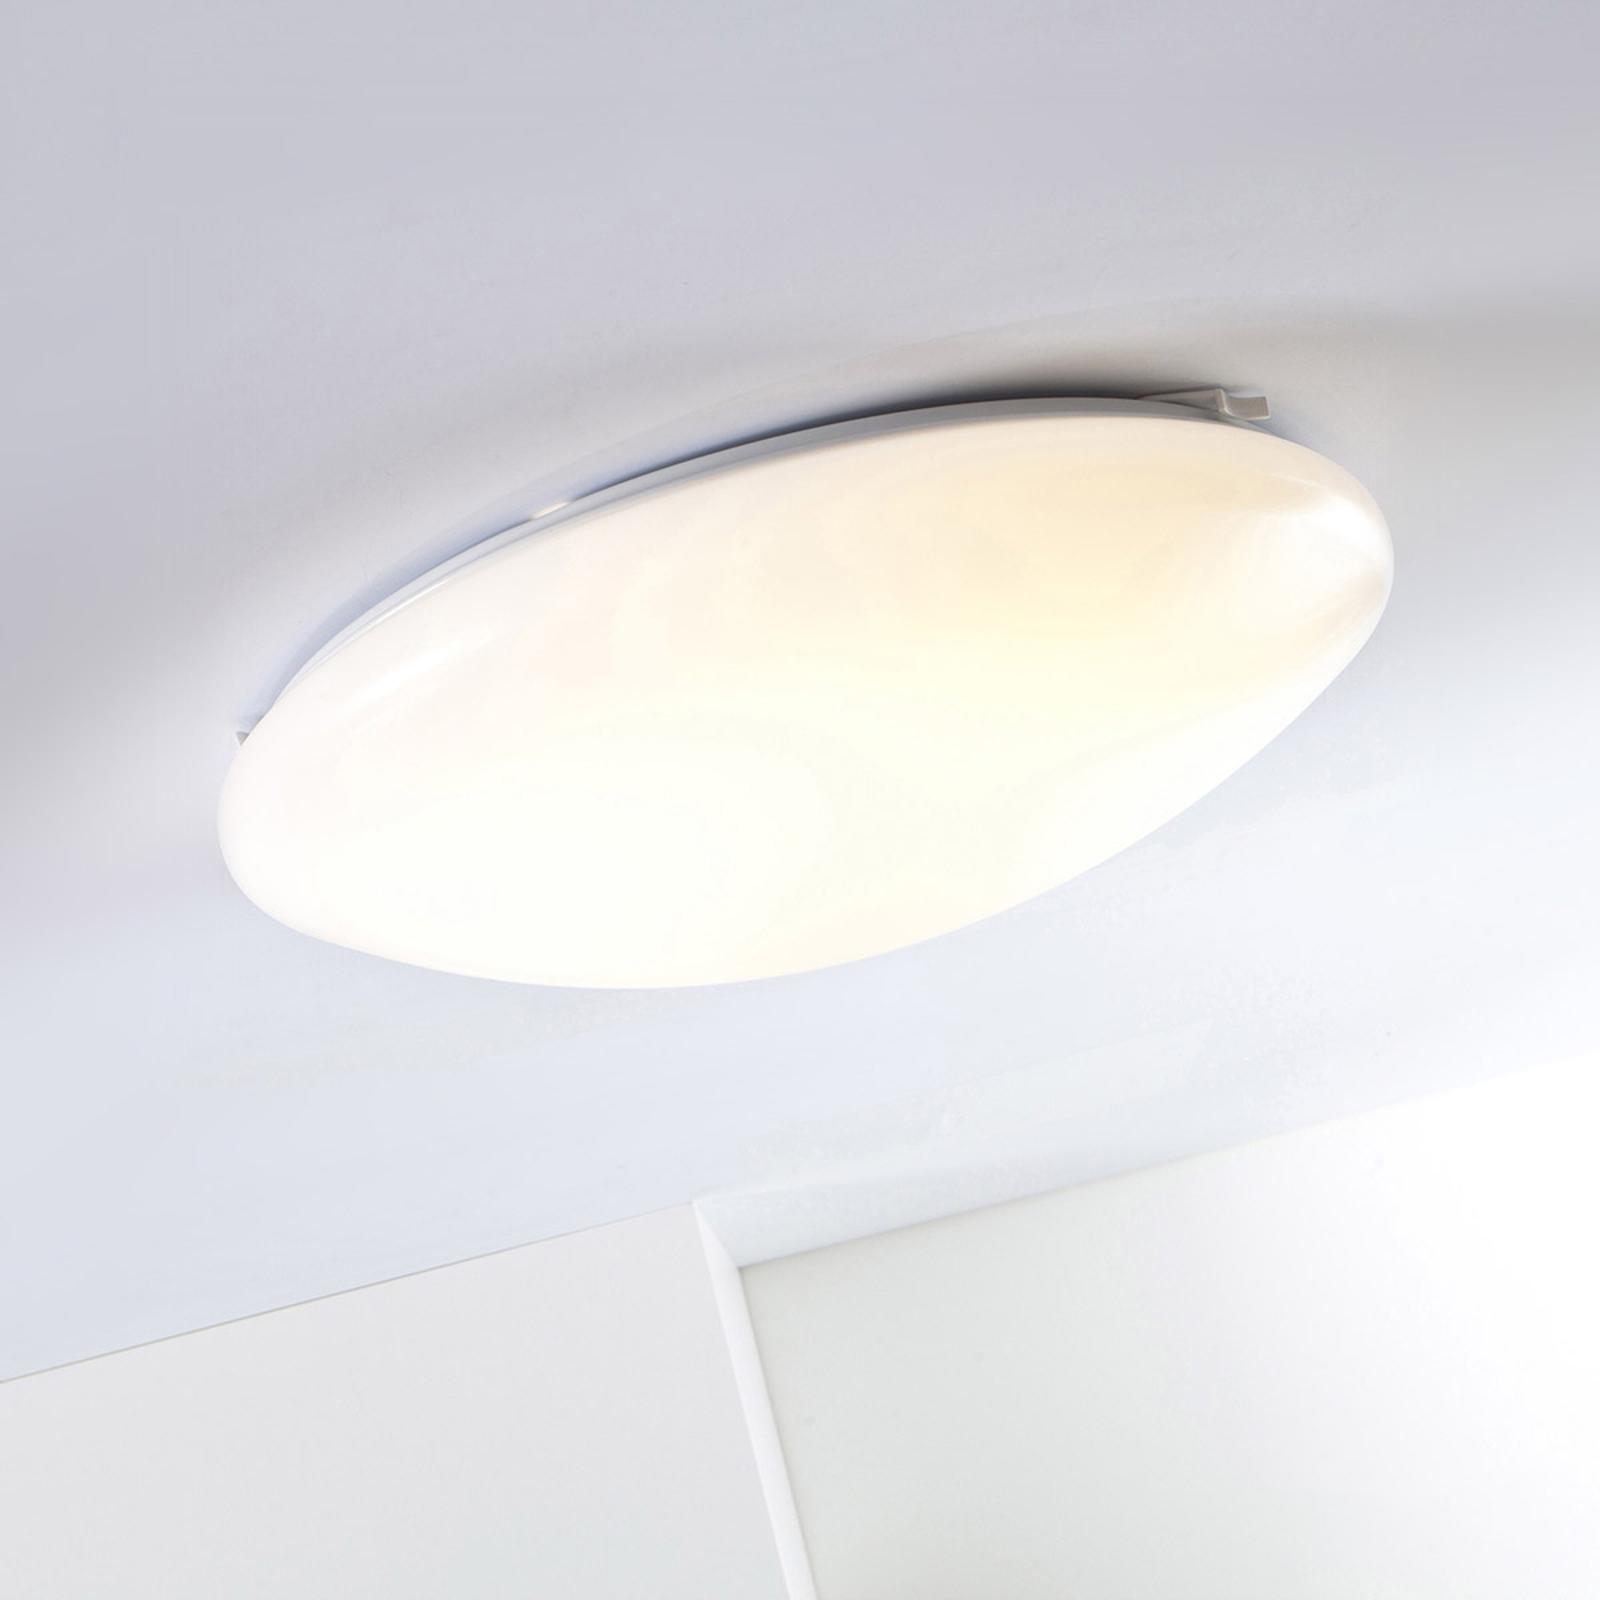 AEG LED Basic runde Deckenleuchte, 14 W